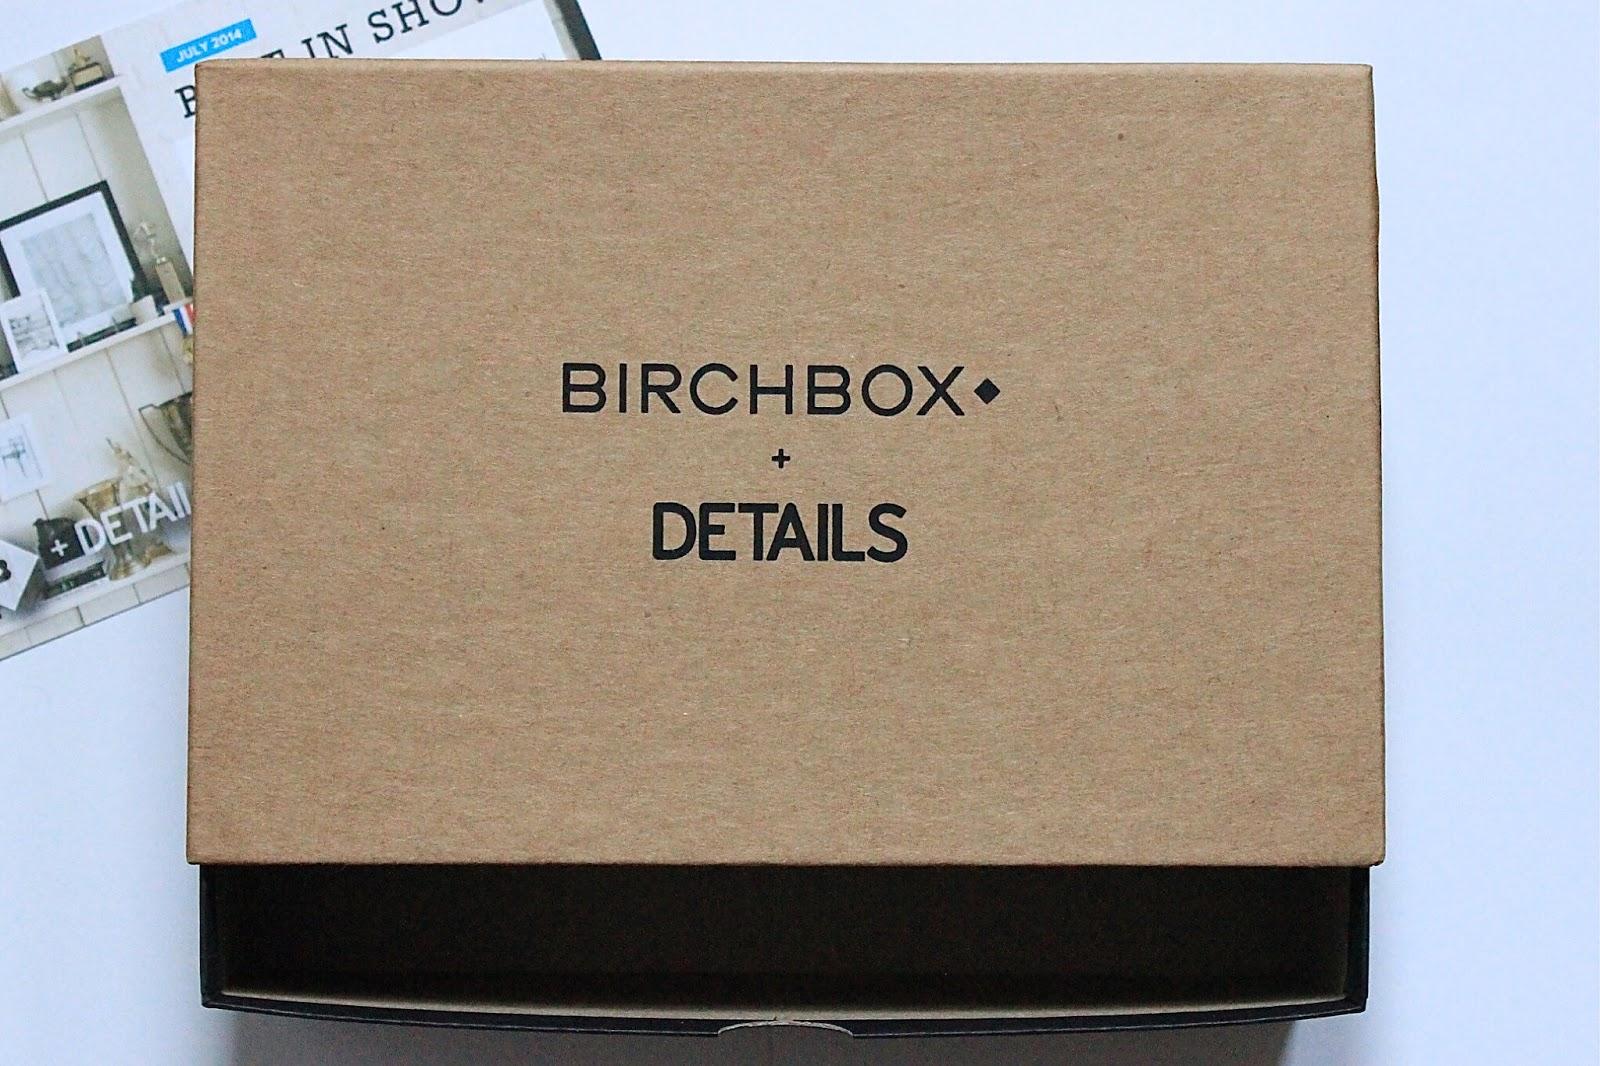 Birchbox Man, Birchbox, July Birchbox